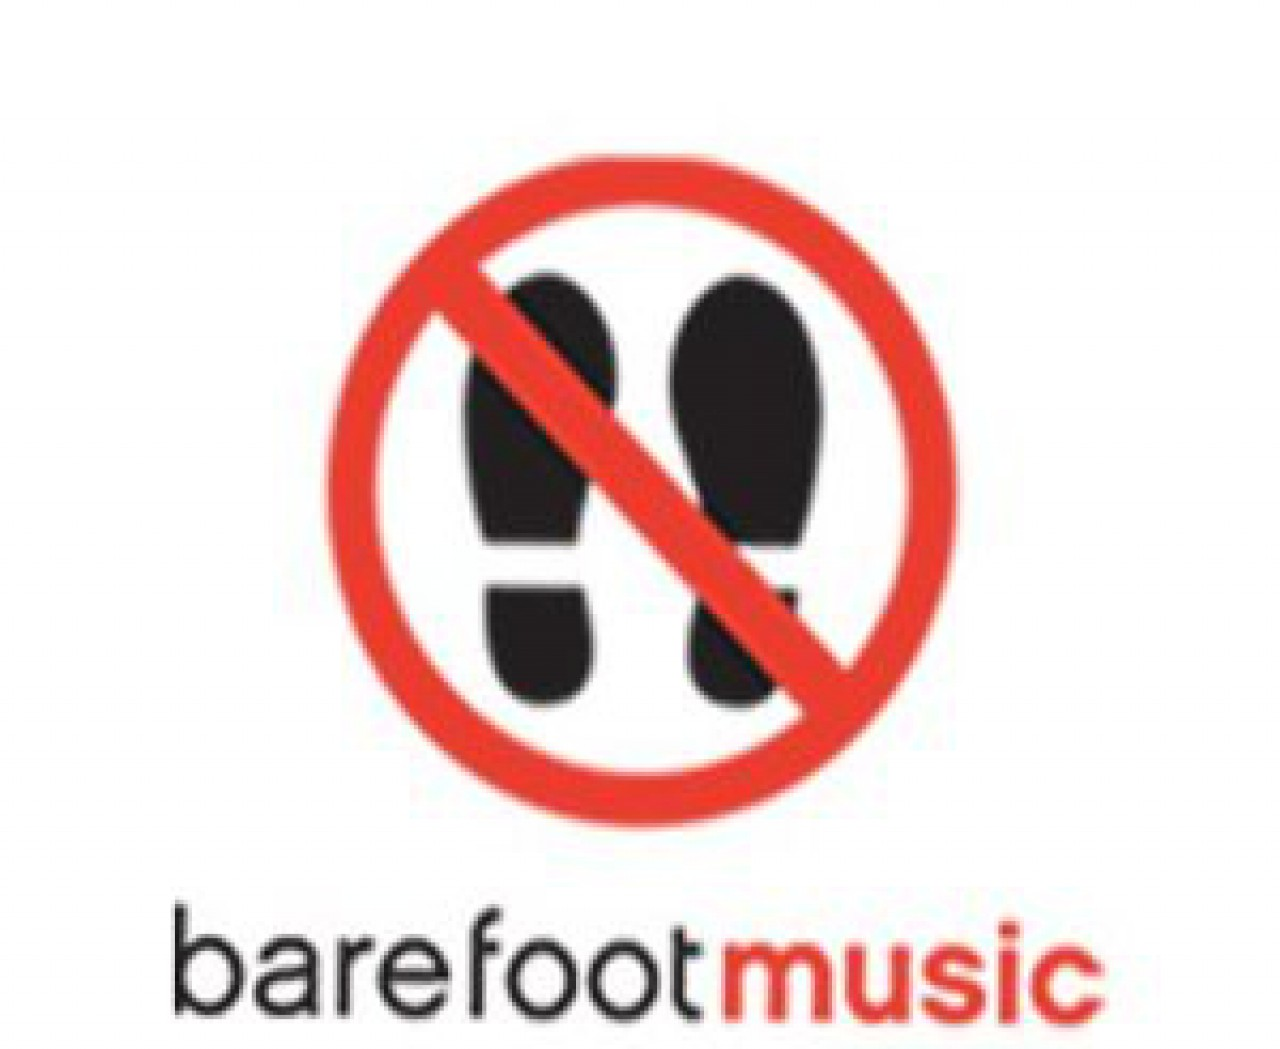 Barefoot baroness thoughts words random me cropped imagebaarefootmusicg malvernweather Image collections